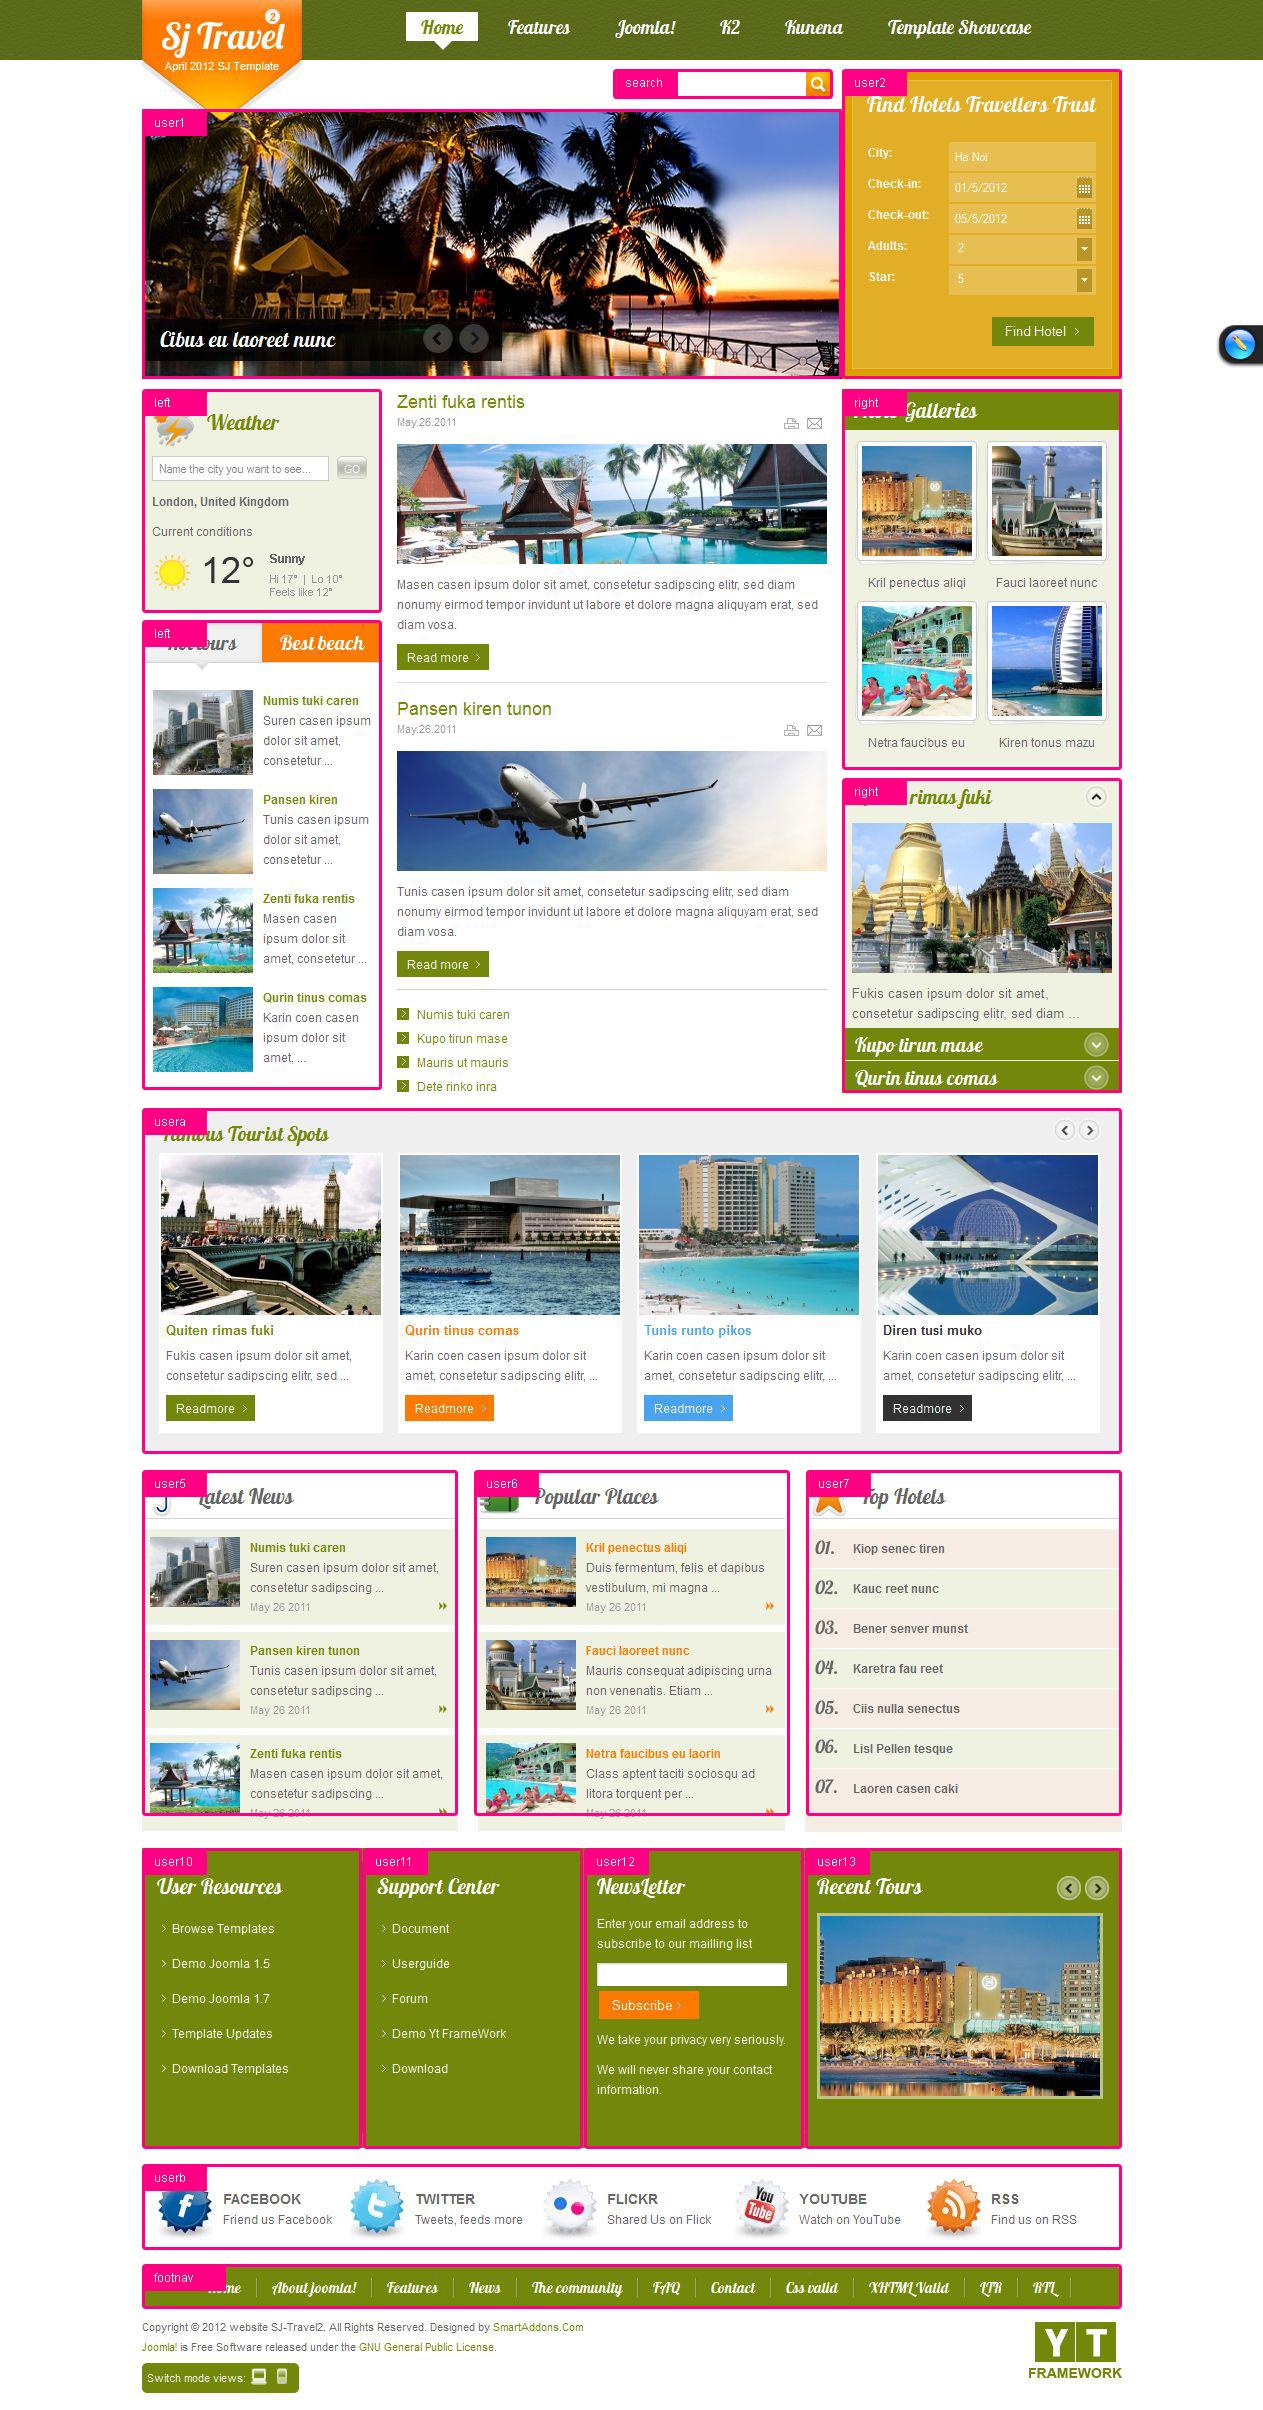 ... version 2 0 1 userguide click here compatible joomla 1 7 x joomla 2 5